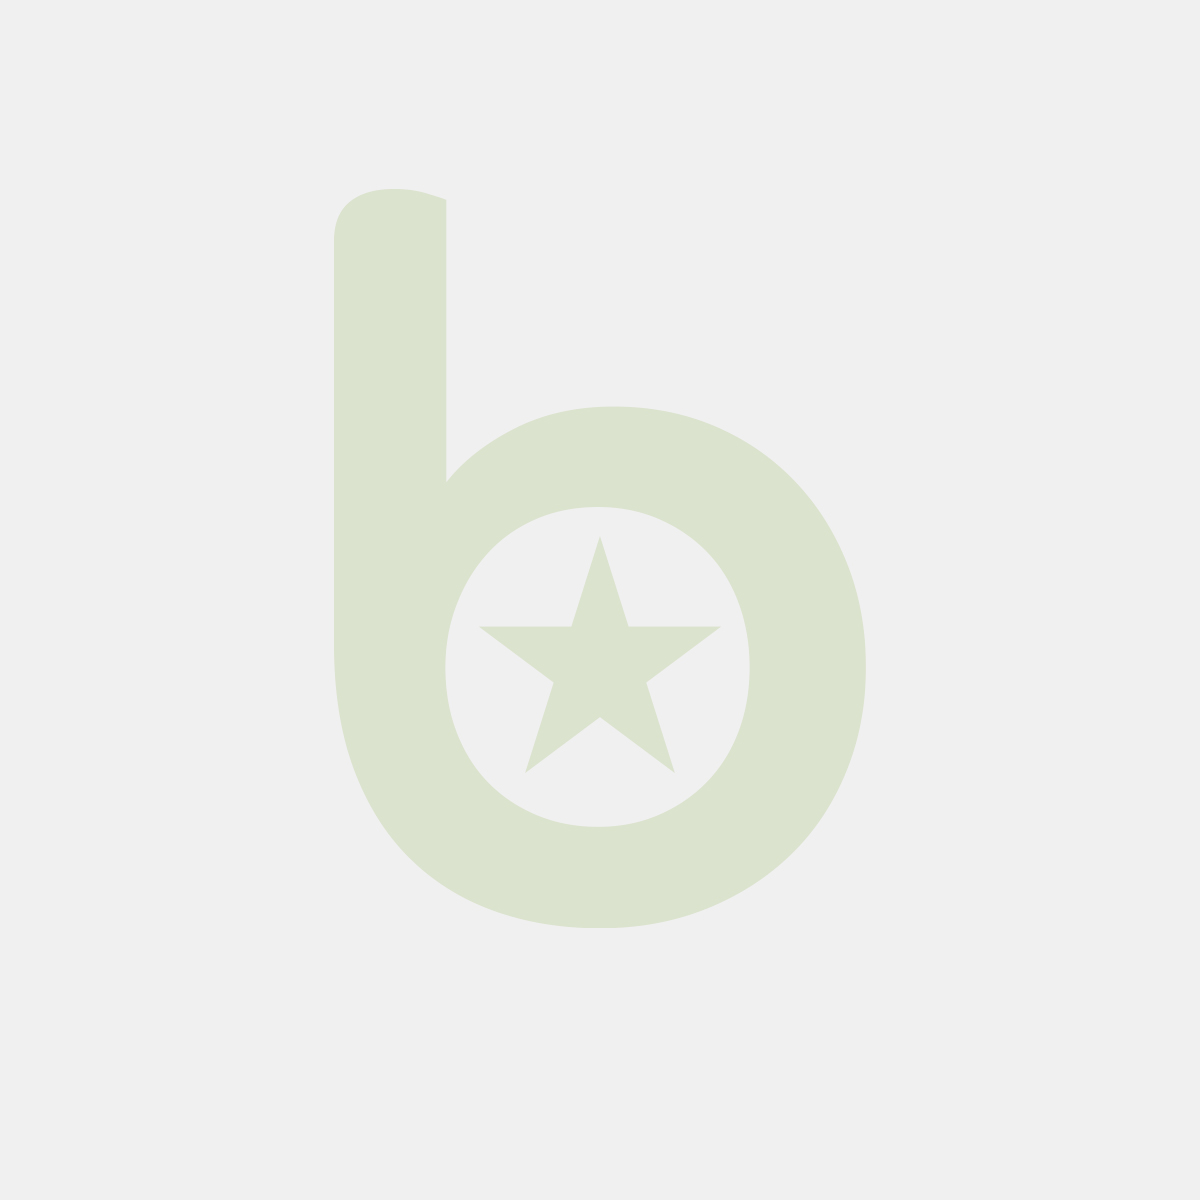 Reklamówki LDPE 37x54 T-SHIRT (300)